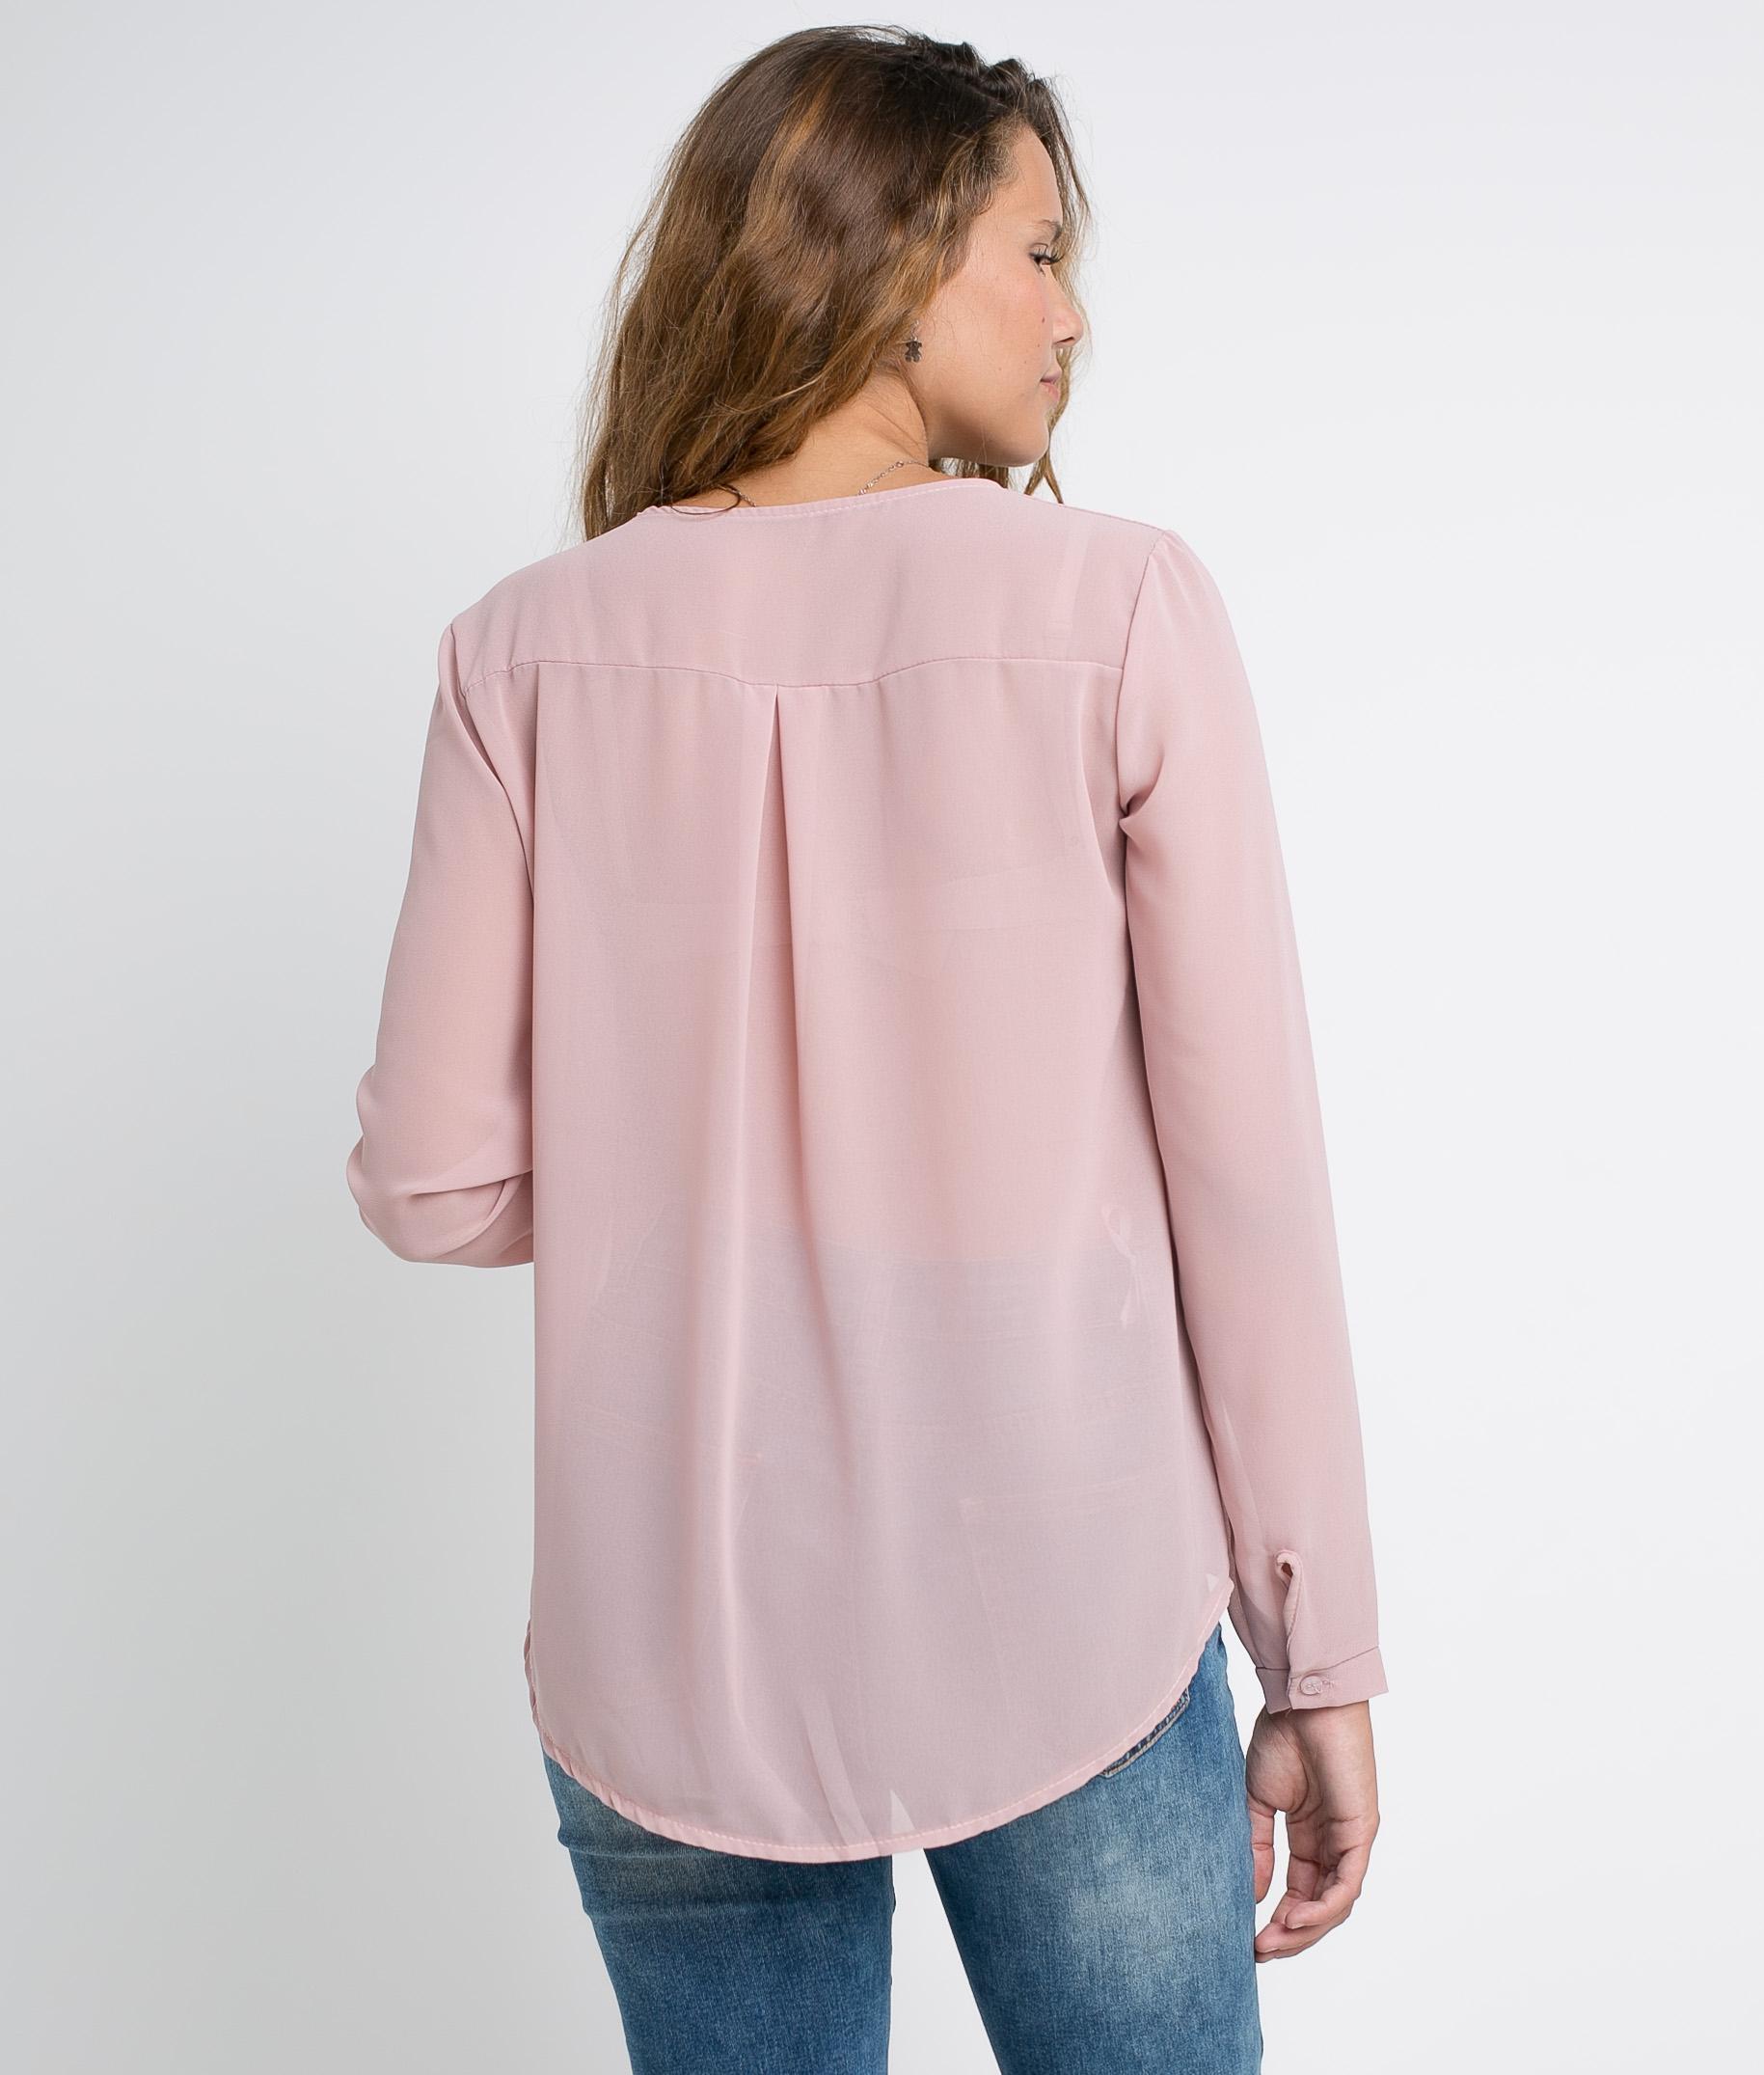 T-shirt Hamjo - Pink